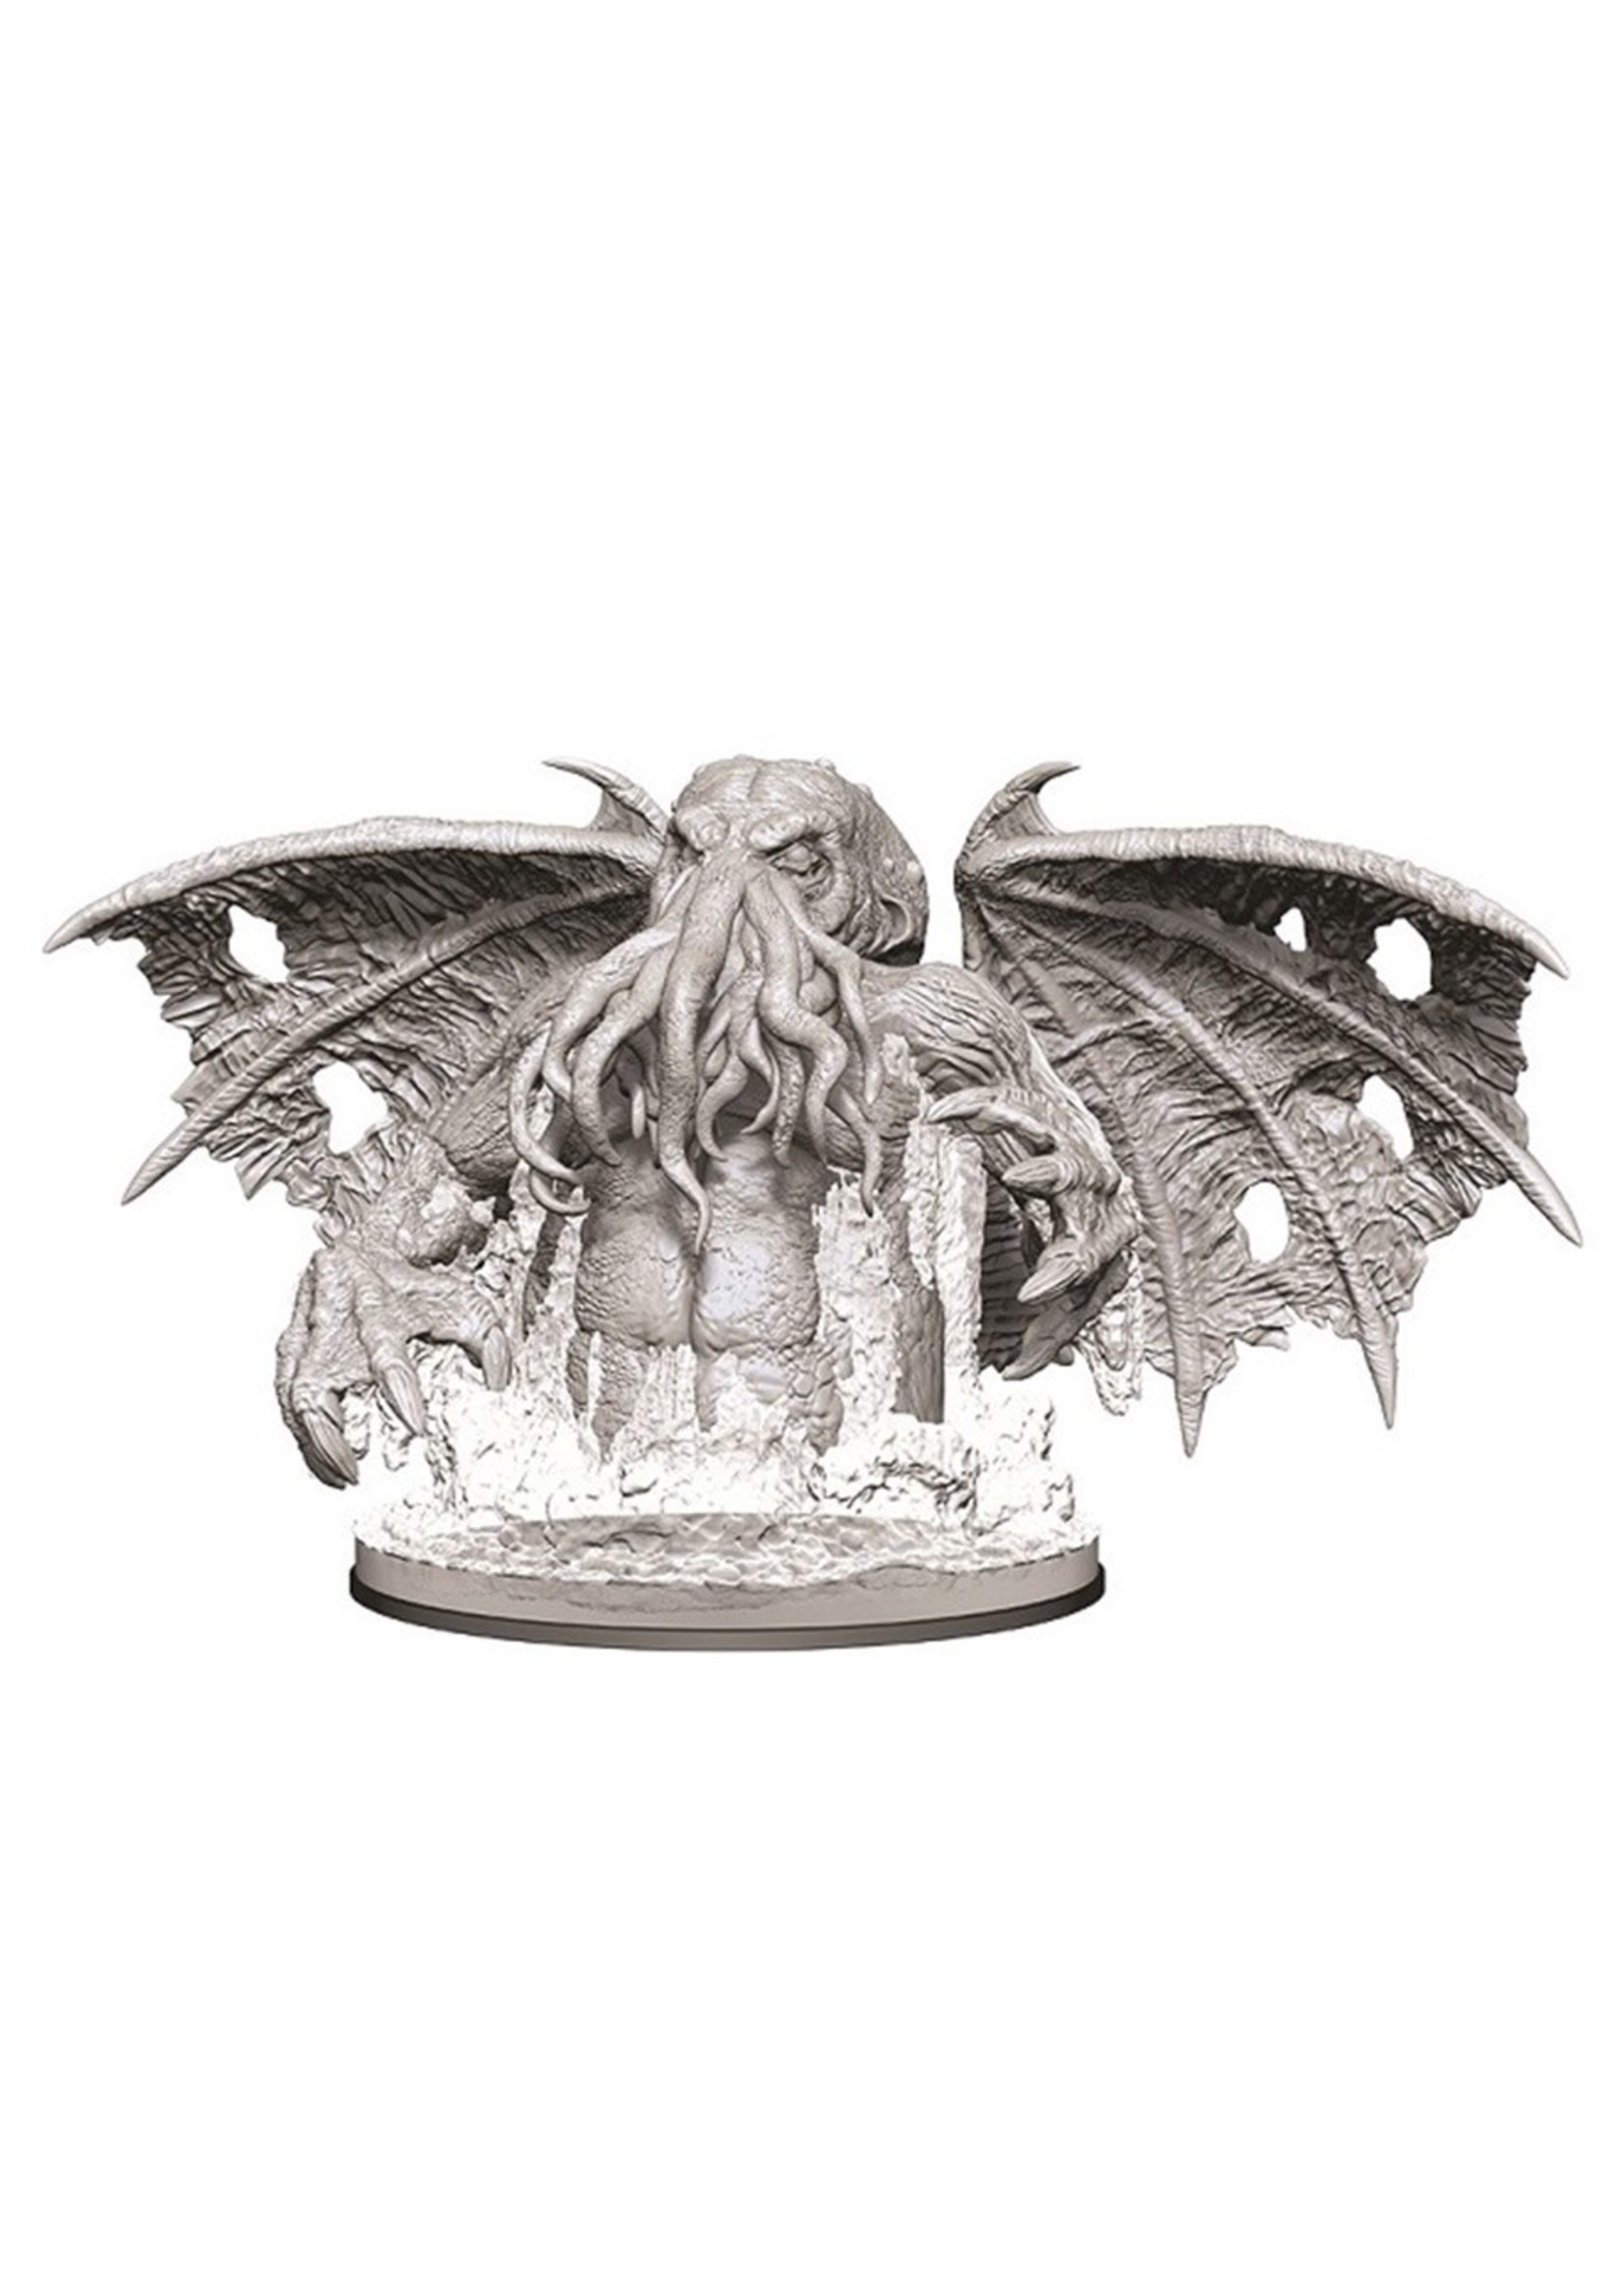 Pathfinder Deep Cuts Unpainted Miniatures: W9 Star-Spawn of Cthulhu